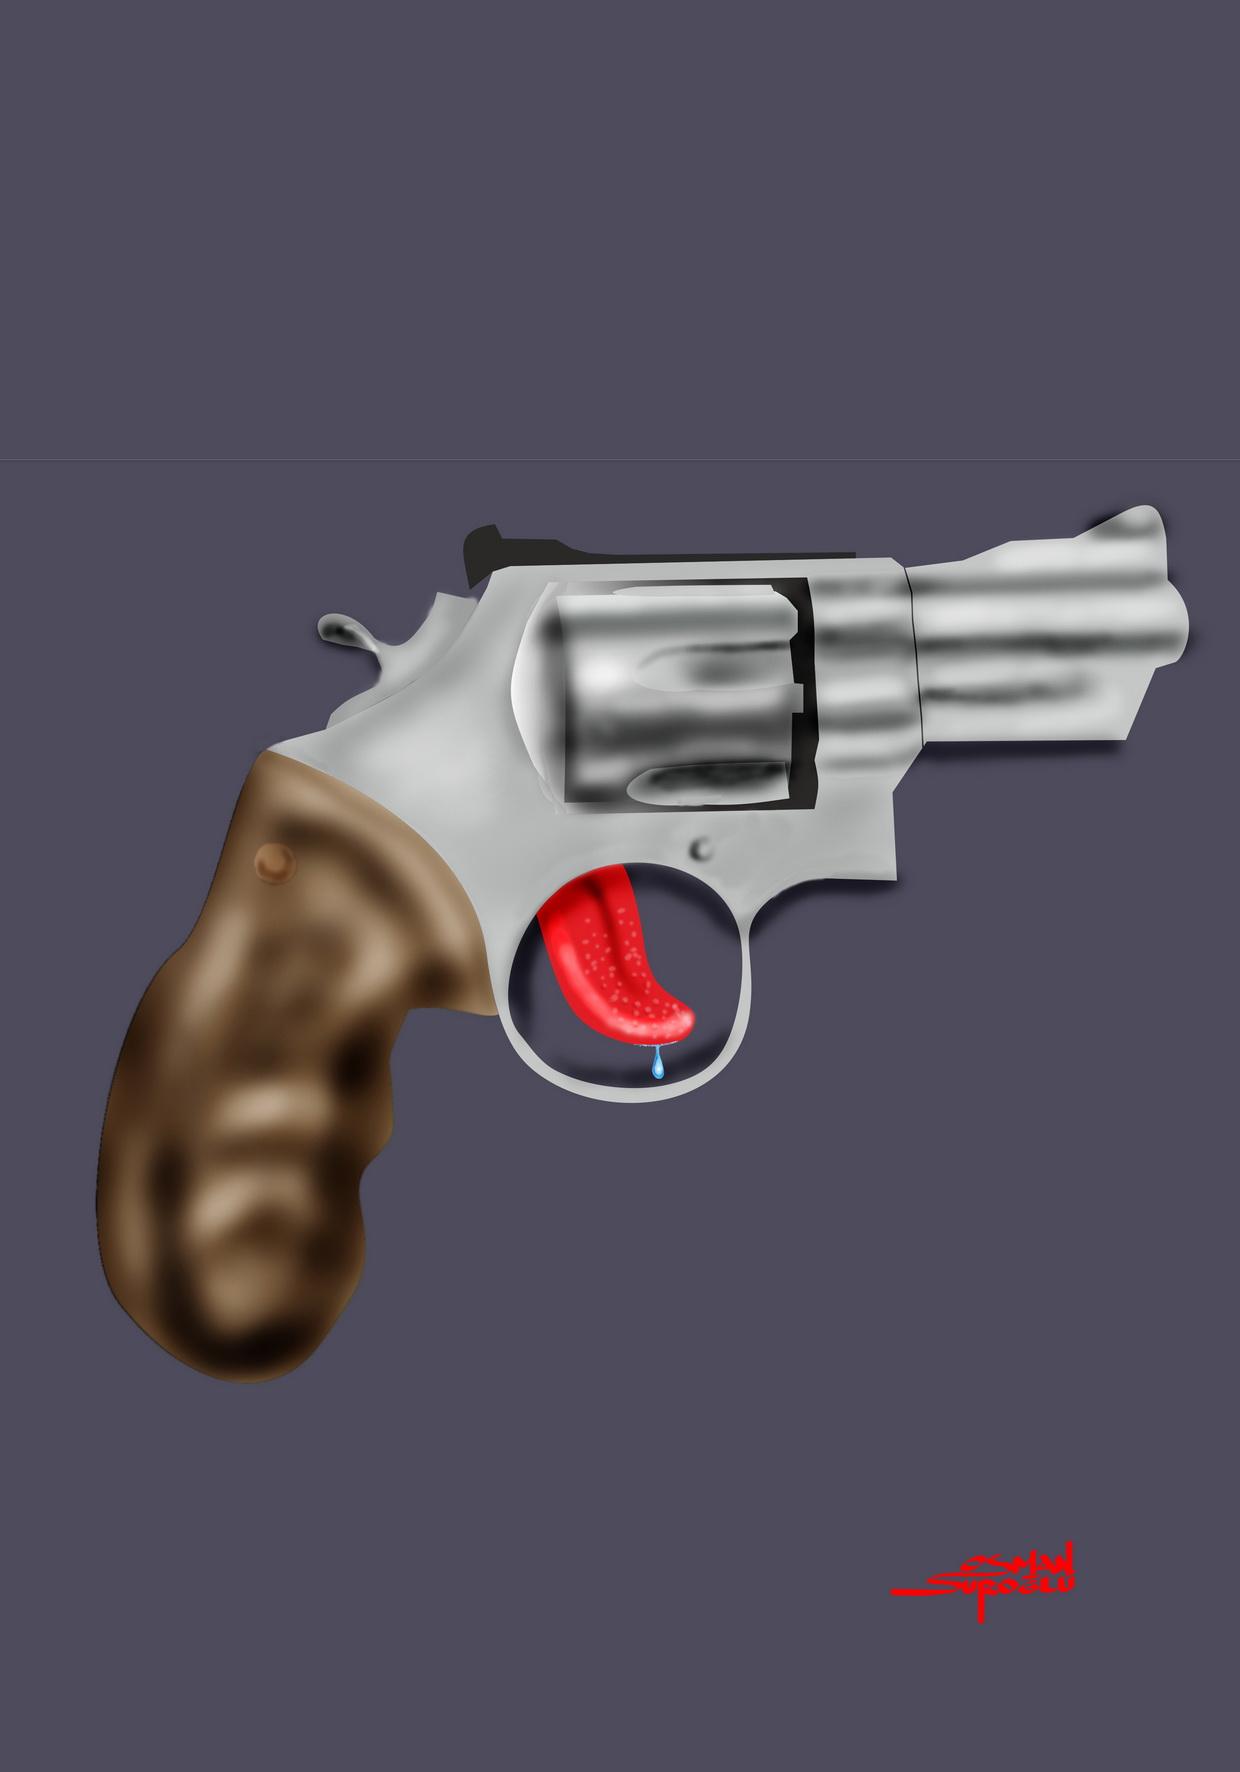 20150525-osman-suroglu-dil-tabanca-1_resize.jpg